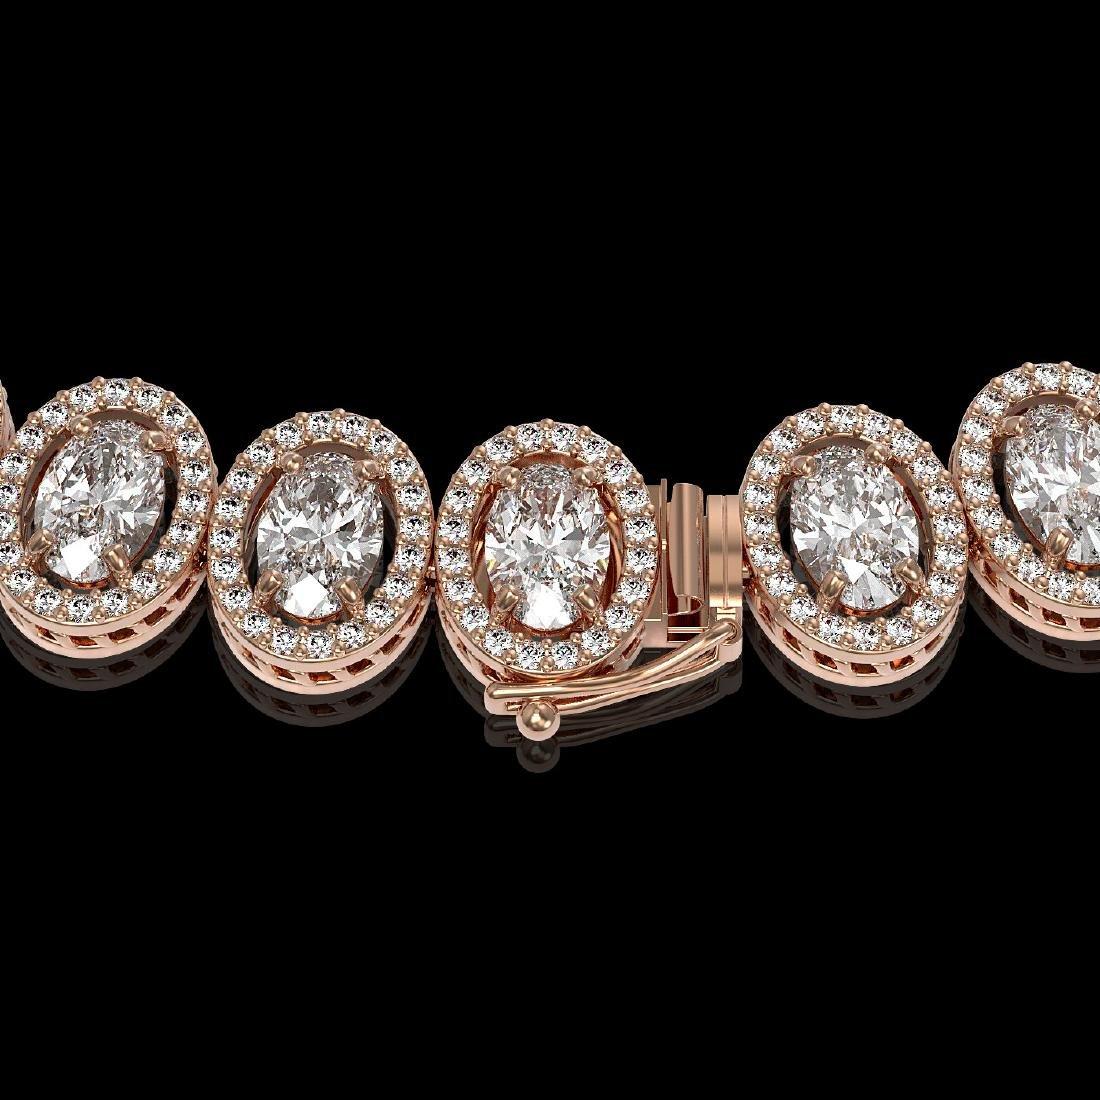 34.72 CTW Oval Diamond Designer Necklace 18K Rose Gold - 3